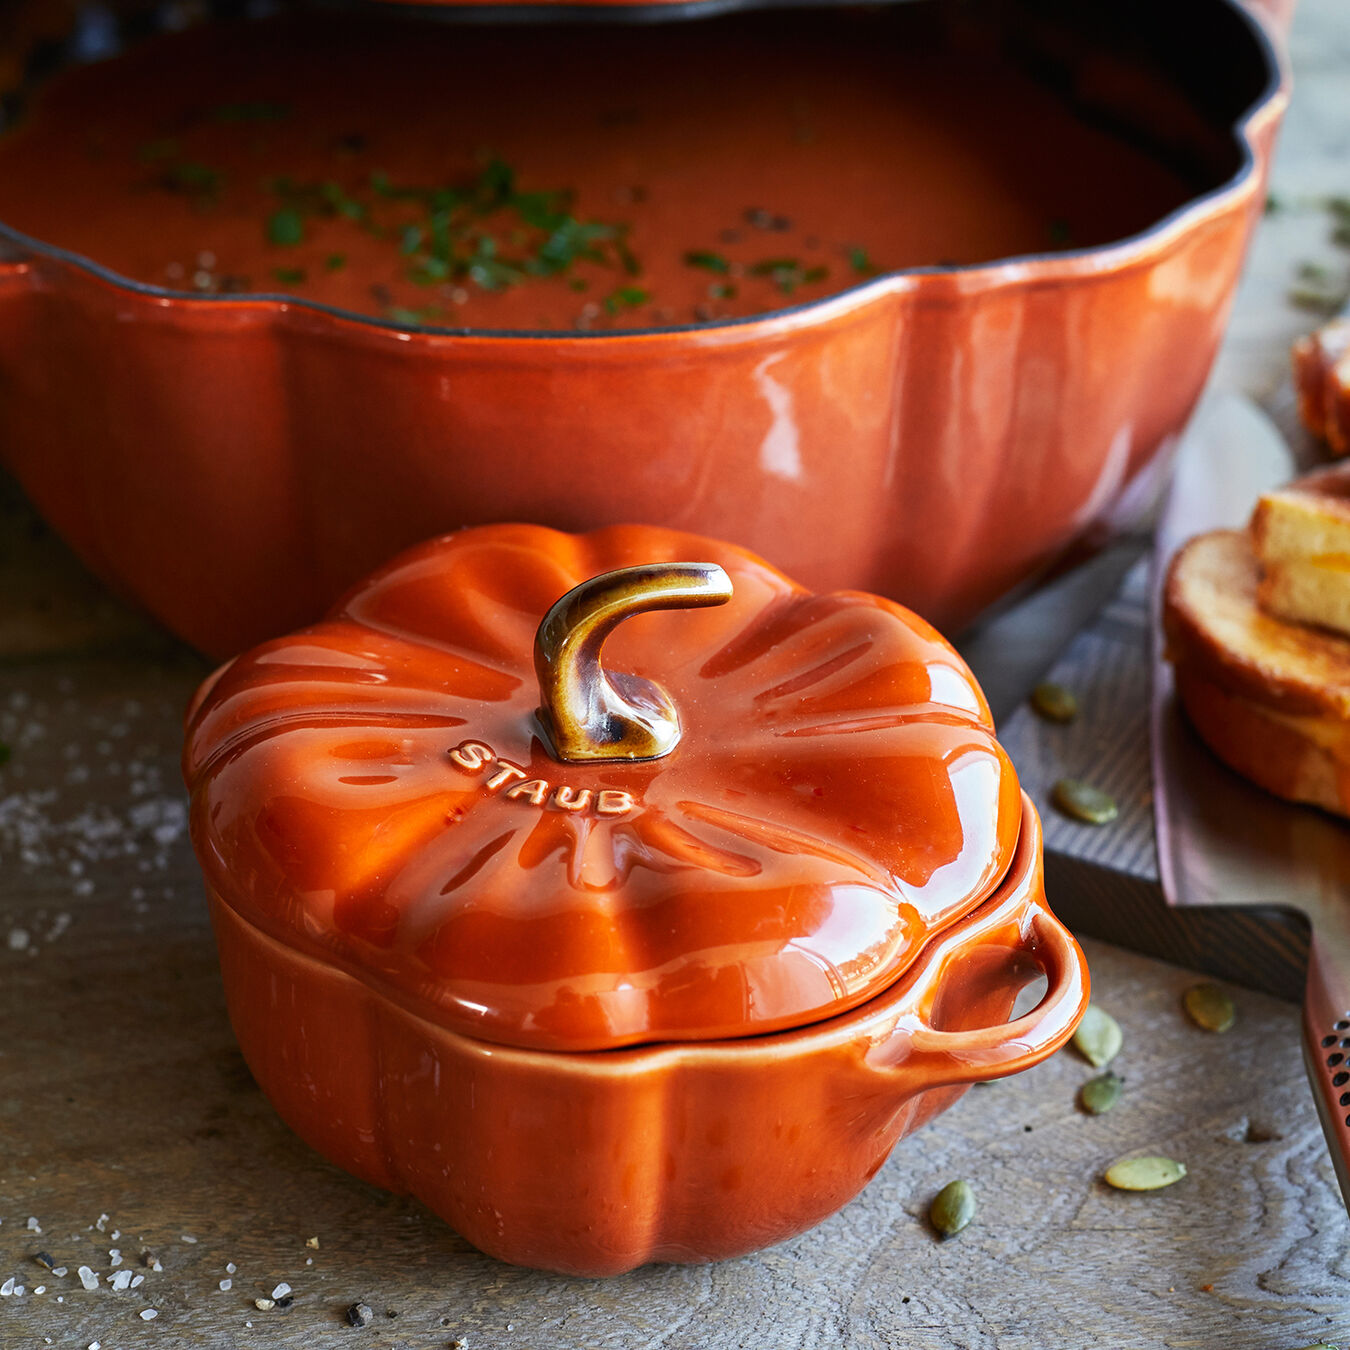 Staub Pumpkin Cocotte Special Cocottes Halloween